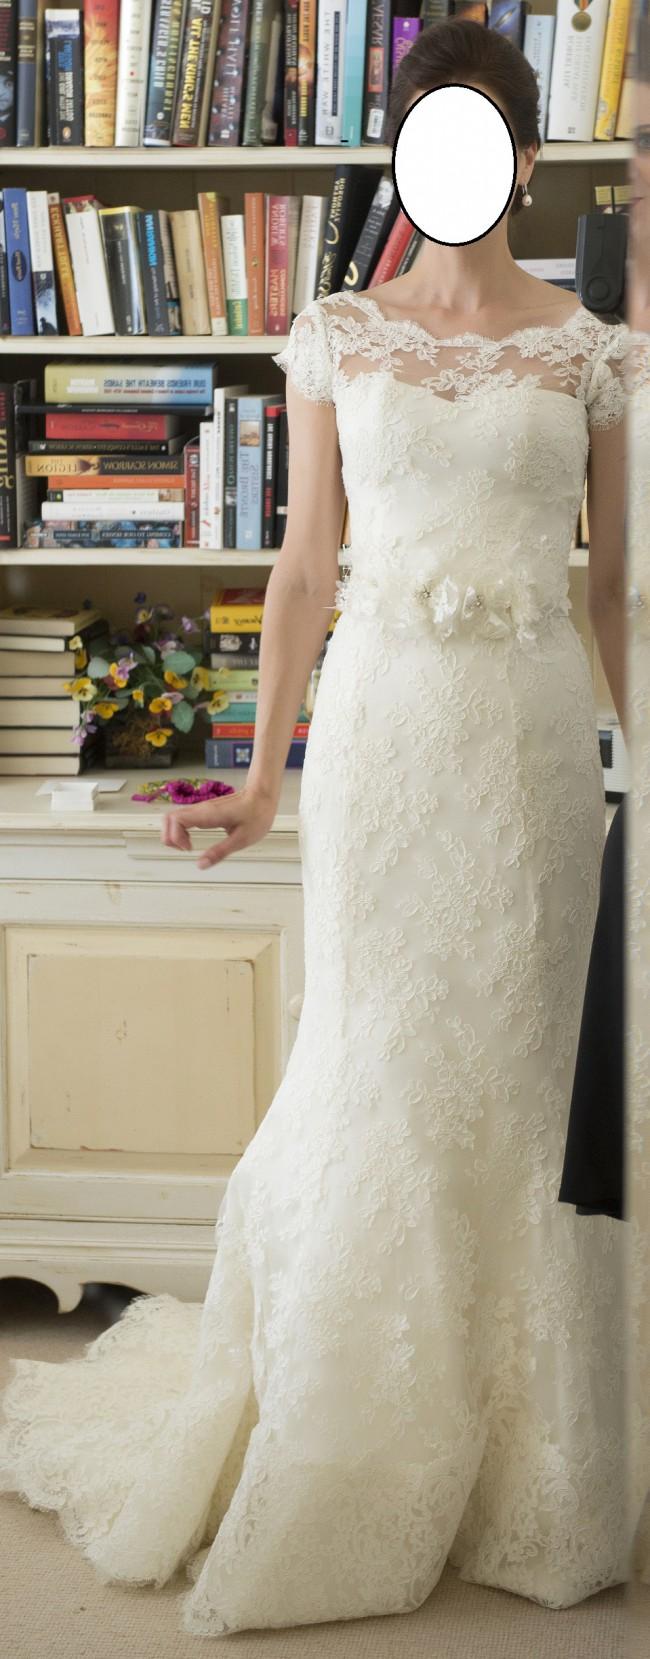 vera wang olivia s used wedding dress on sale 81 off. Black Bedroom Furniture Sets. Home Design Ideas